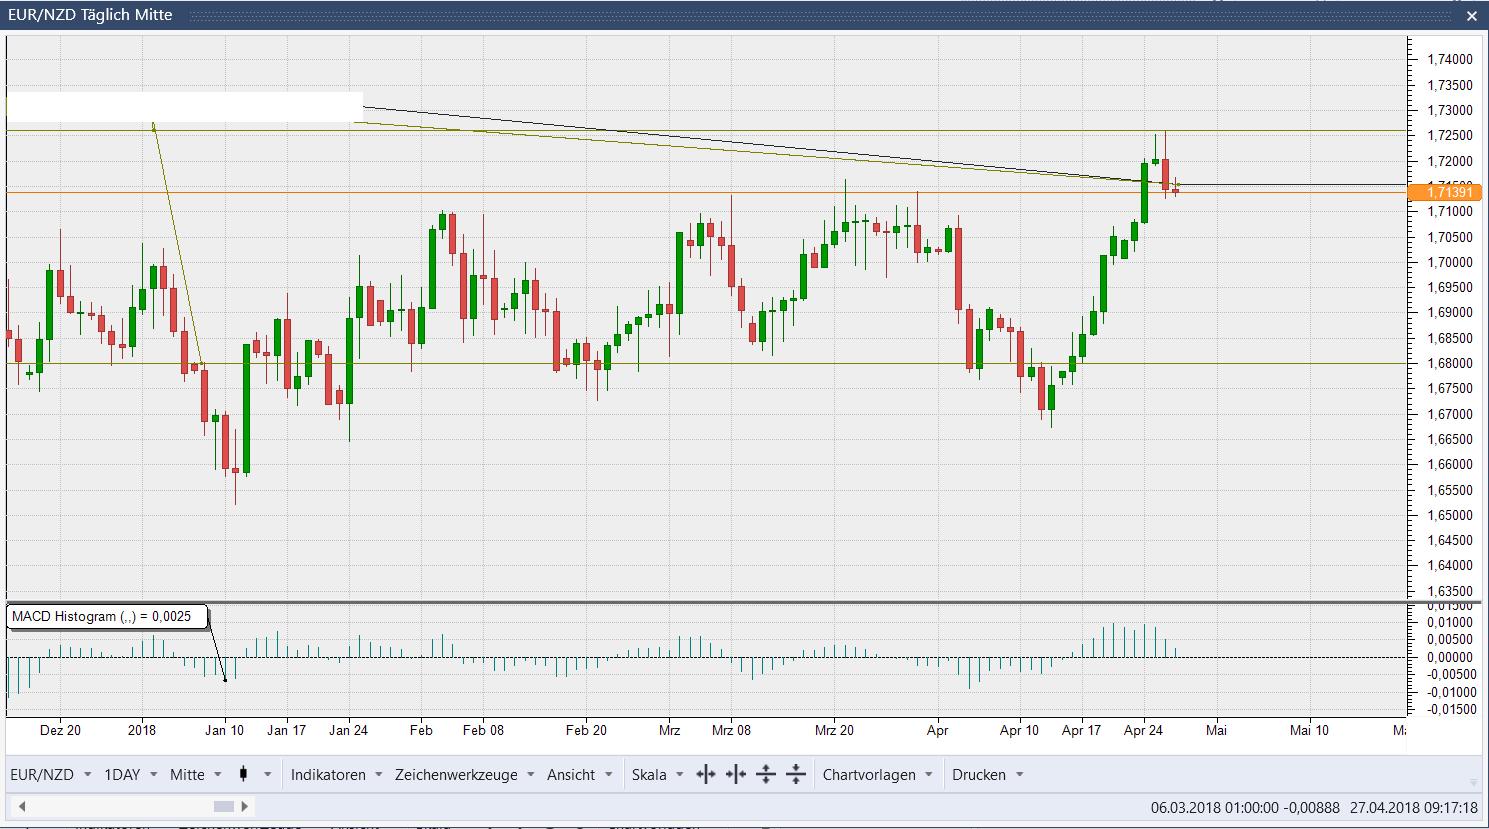 EUR/NZD Kerzen Tages Chart: Umkehrstab Upthrust Pattern in Aktion